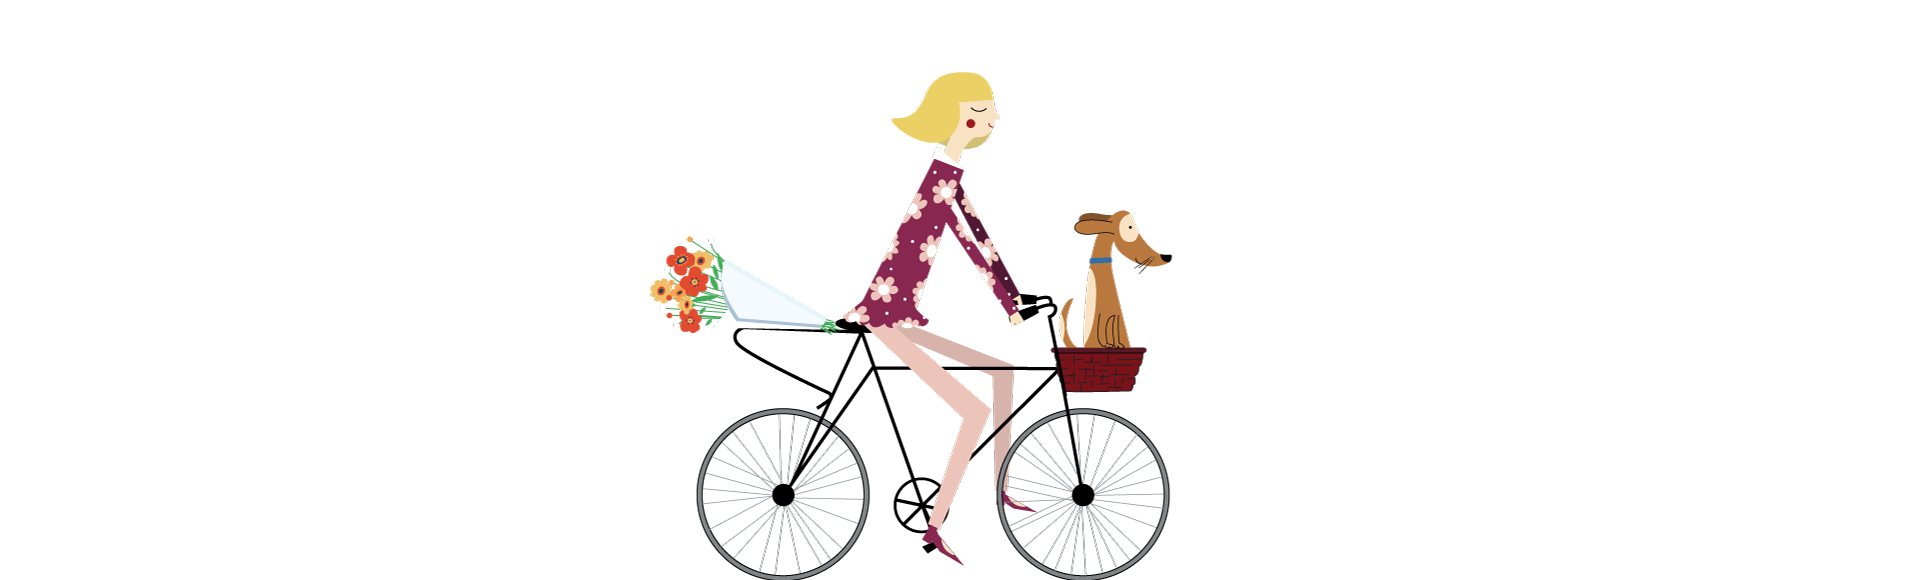 Lady-riding-her-bike-w-dog-illustration.png